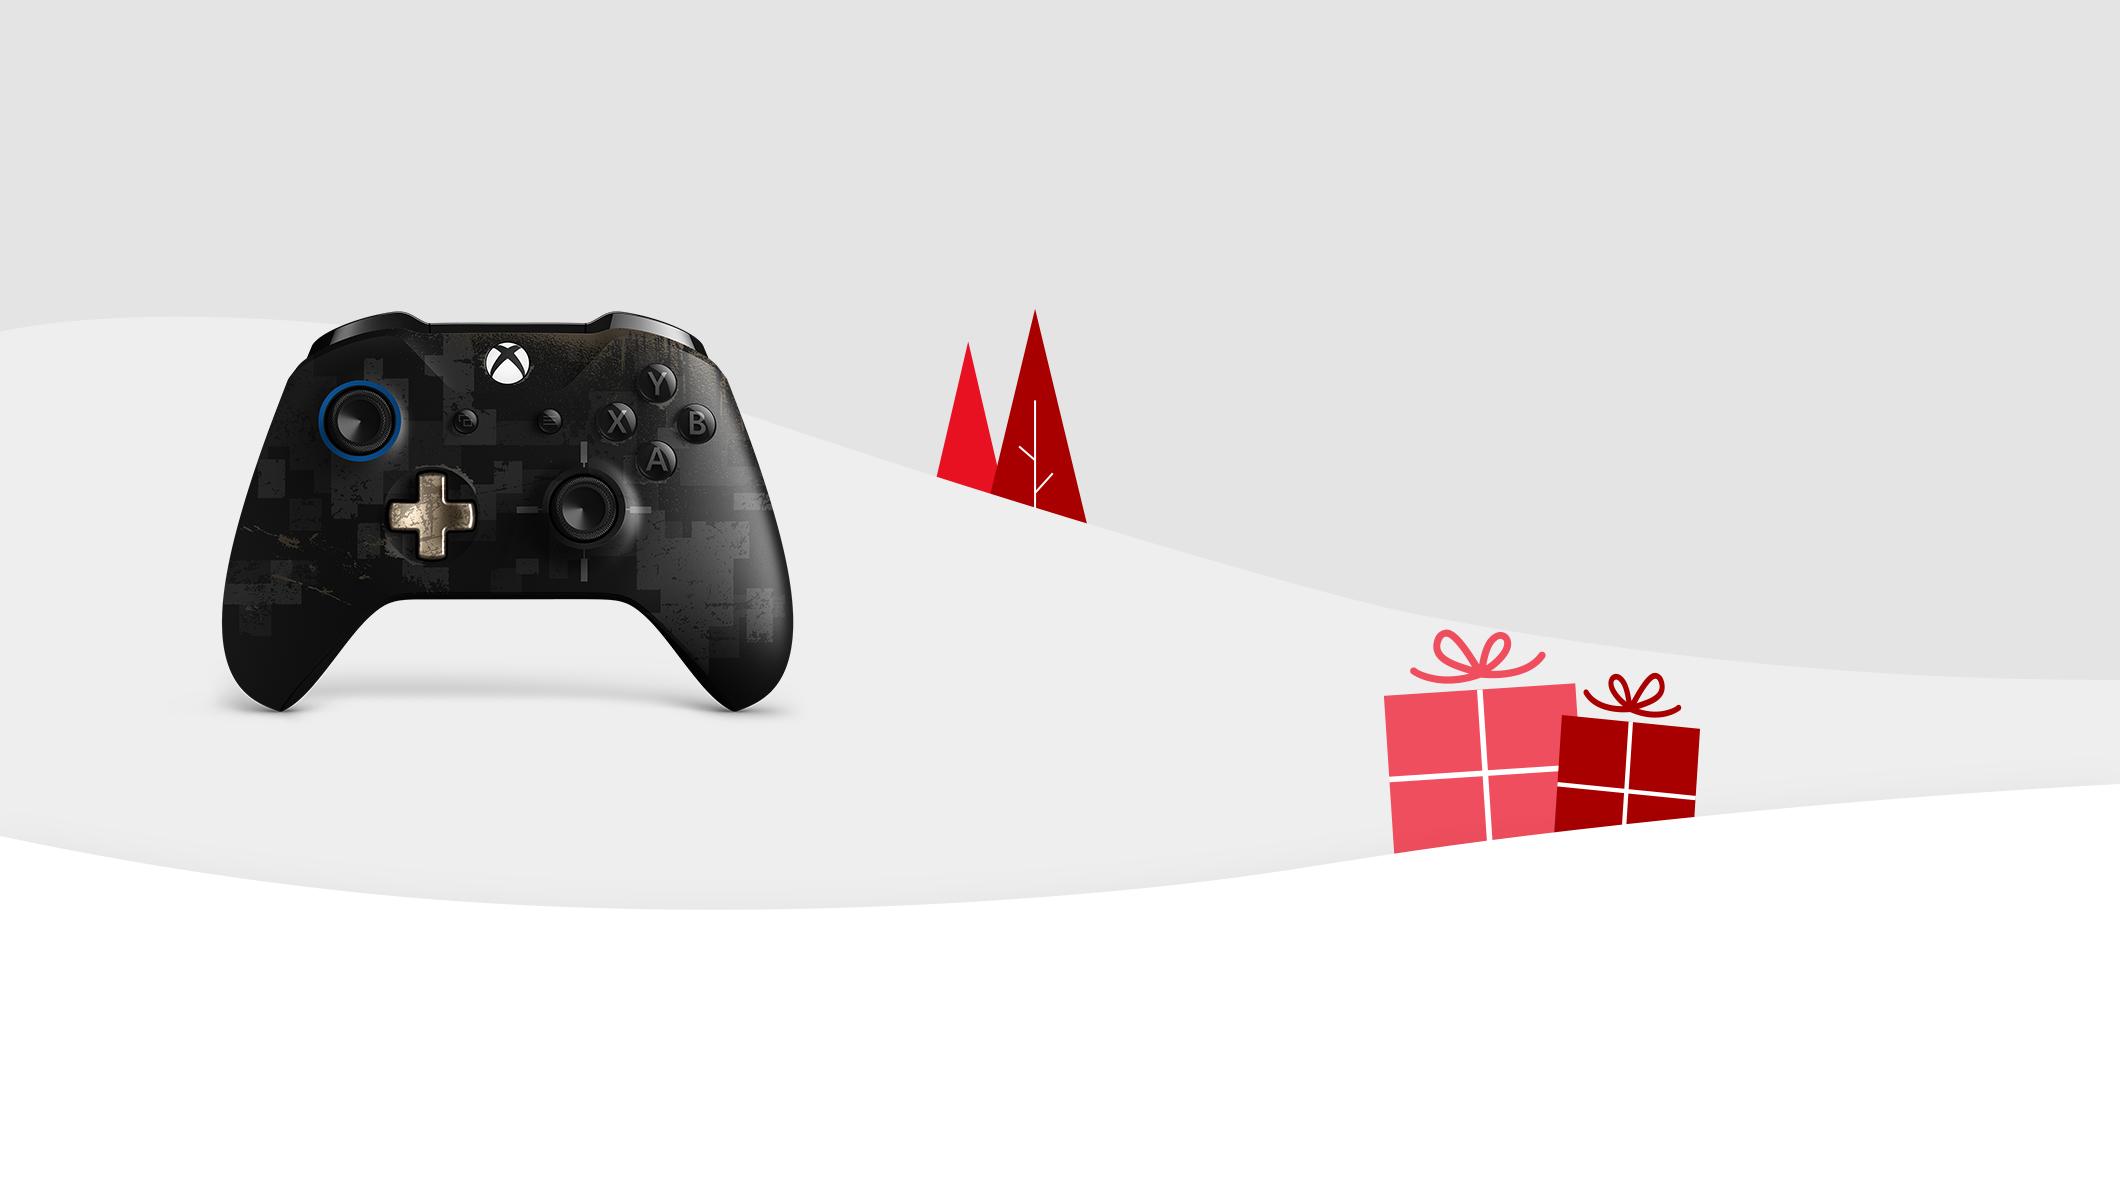 A PUBG Xbox One Controller